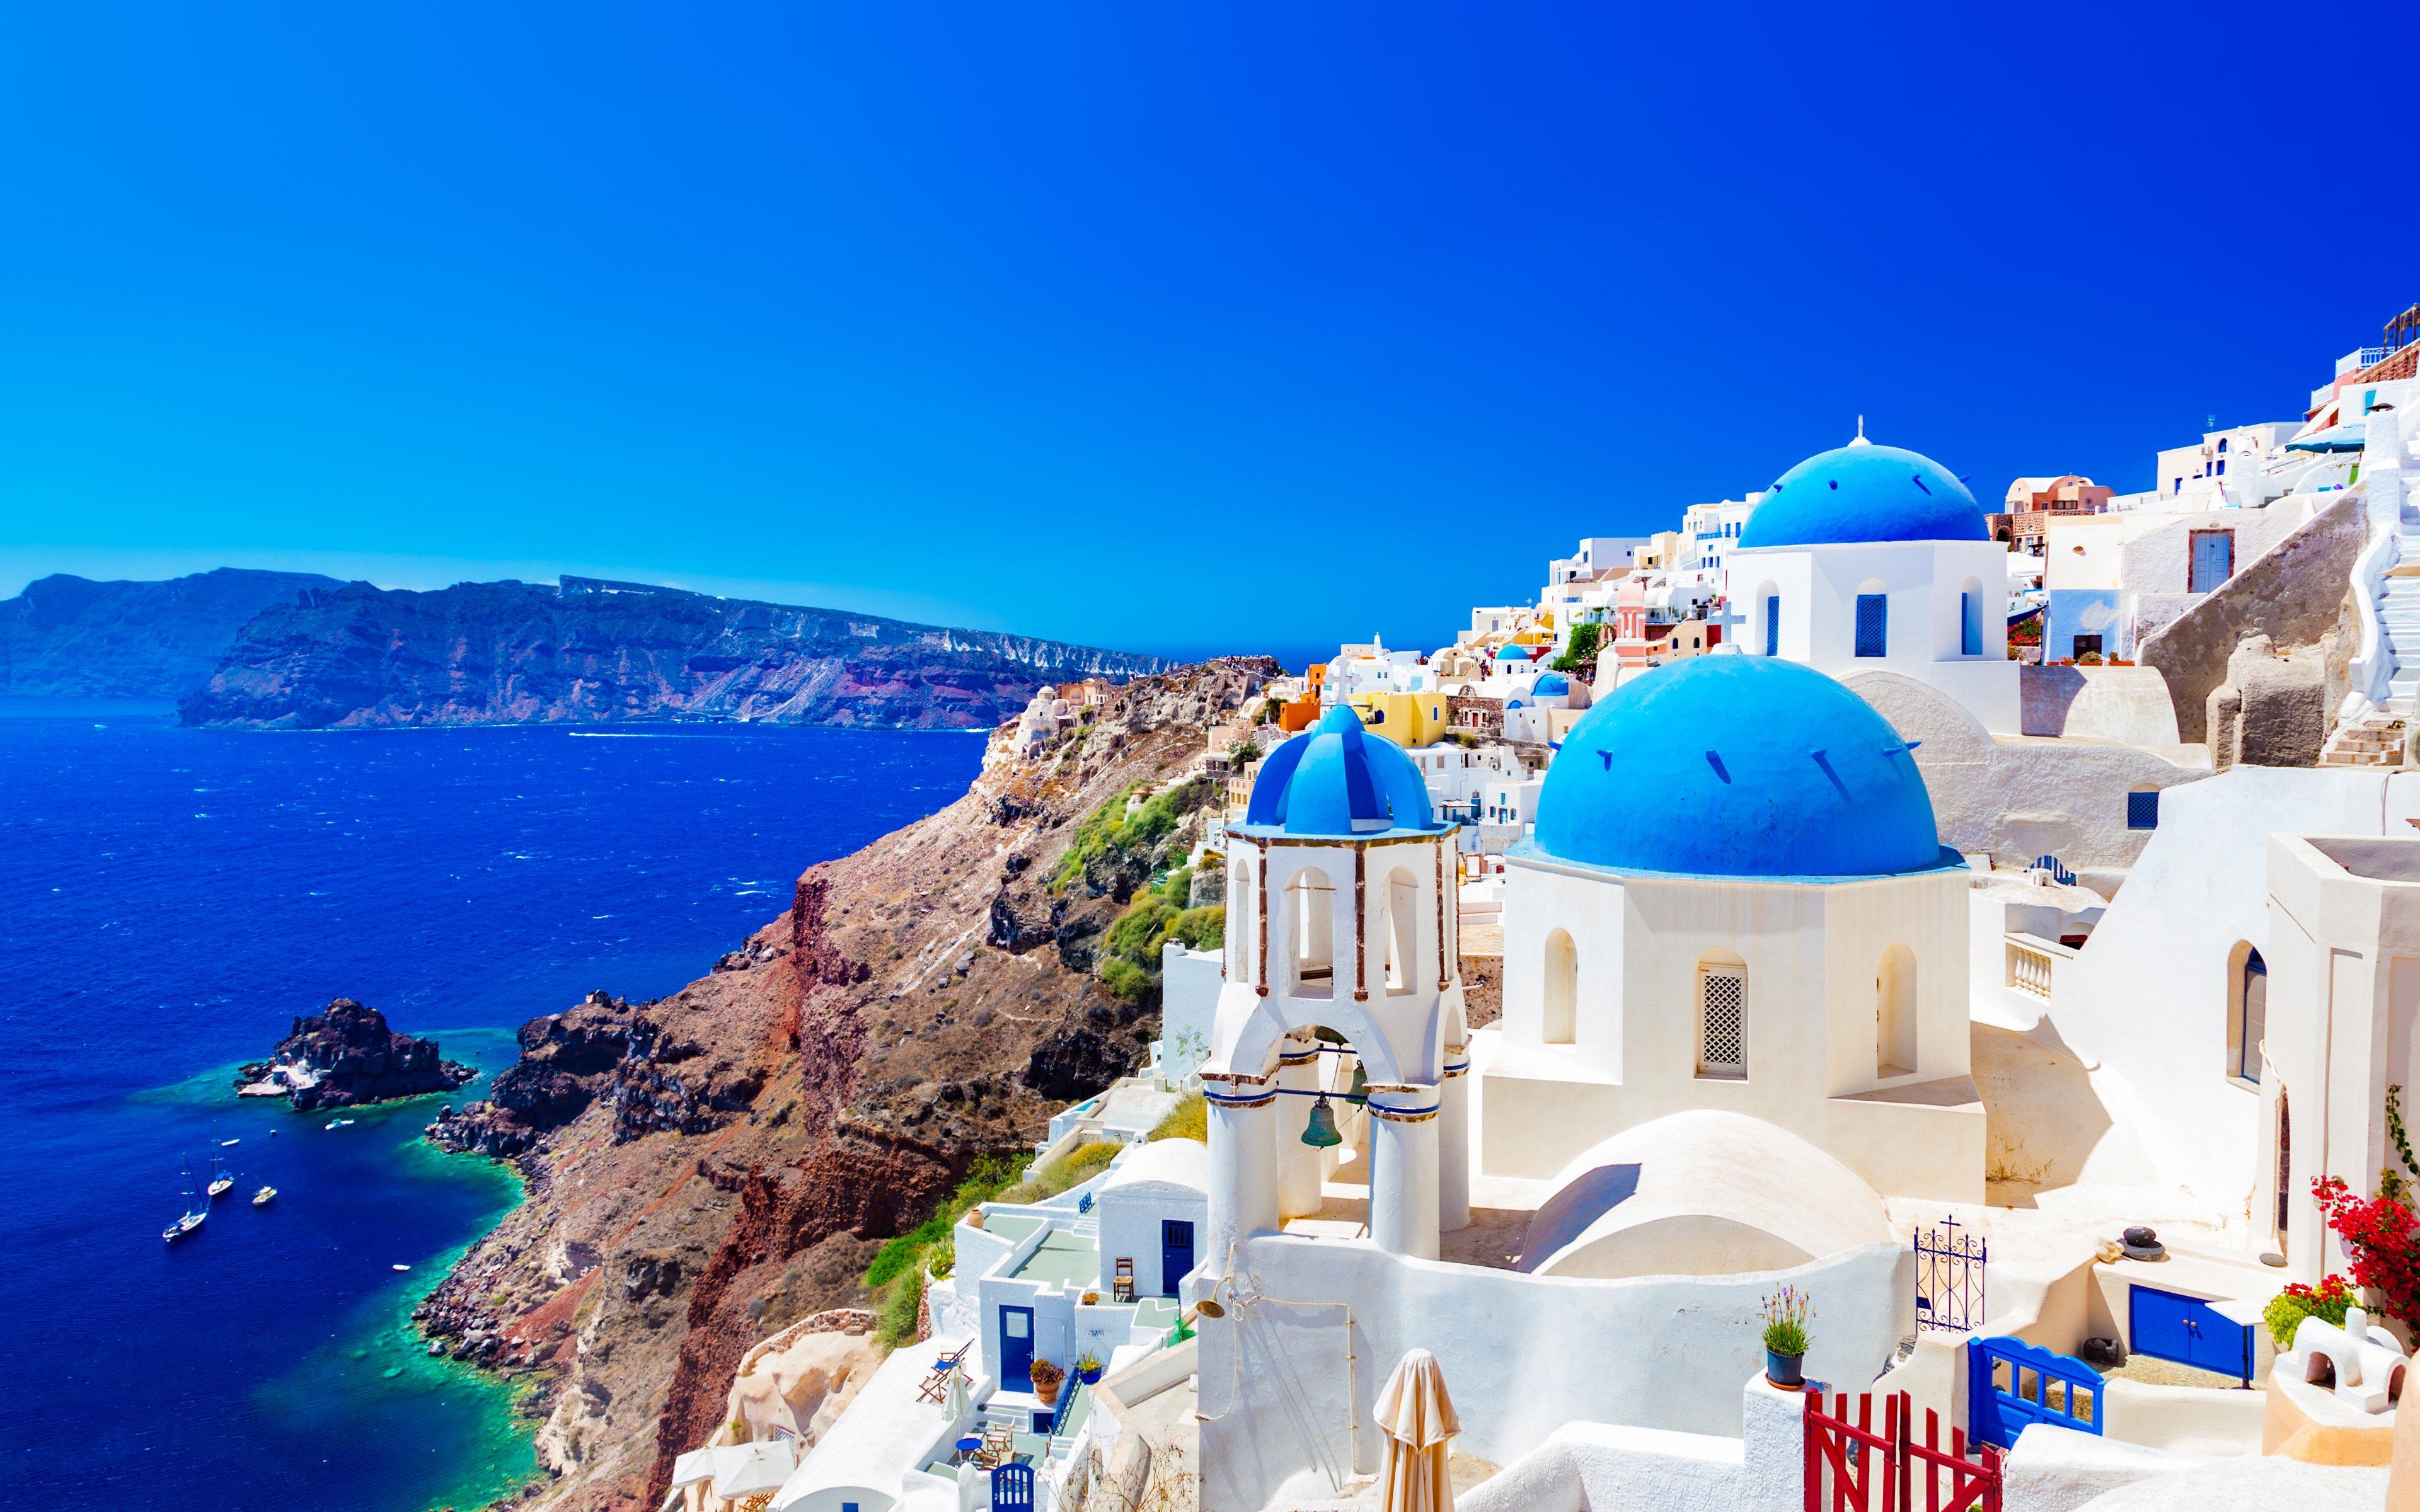 Download wallpapers Greek island Thira summer Santorini Greece 3840x2400